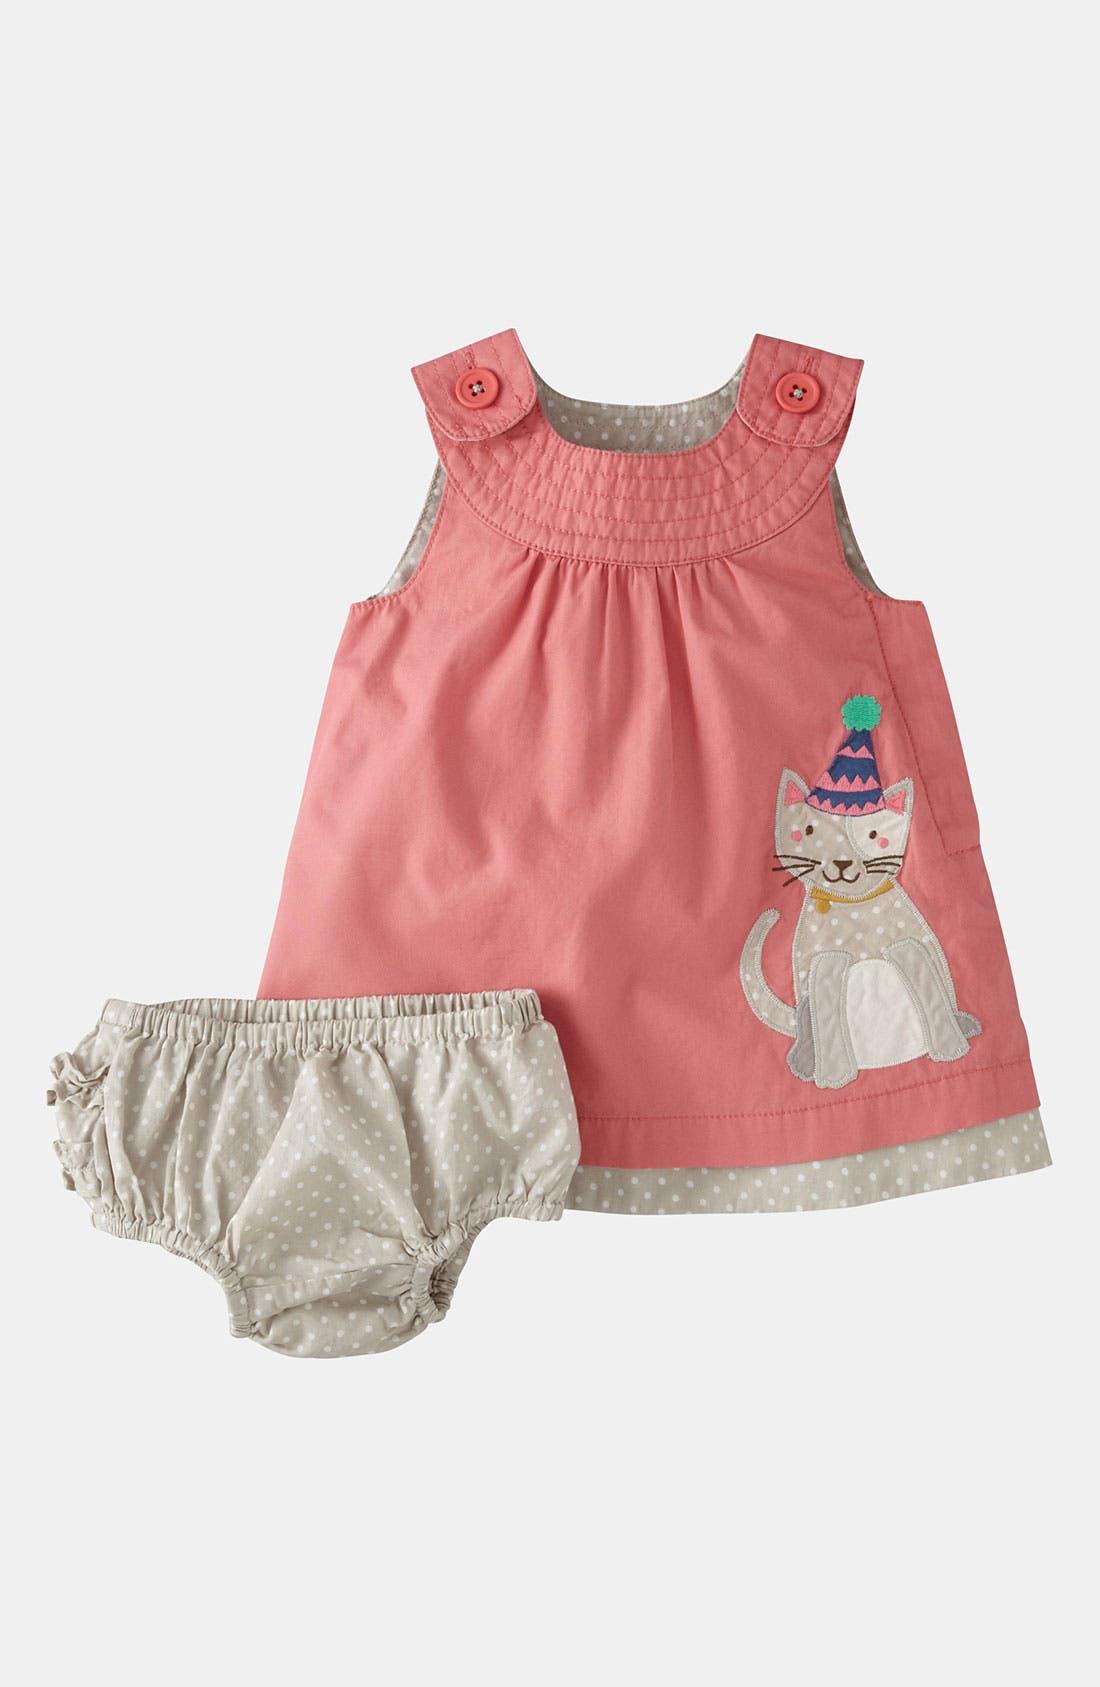 Alternate Image 1 Selected - Mini Boden Appliqué Dress & Bloomers (Infant)